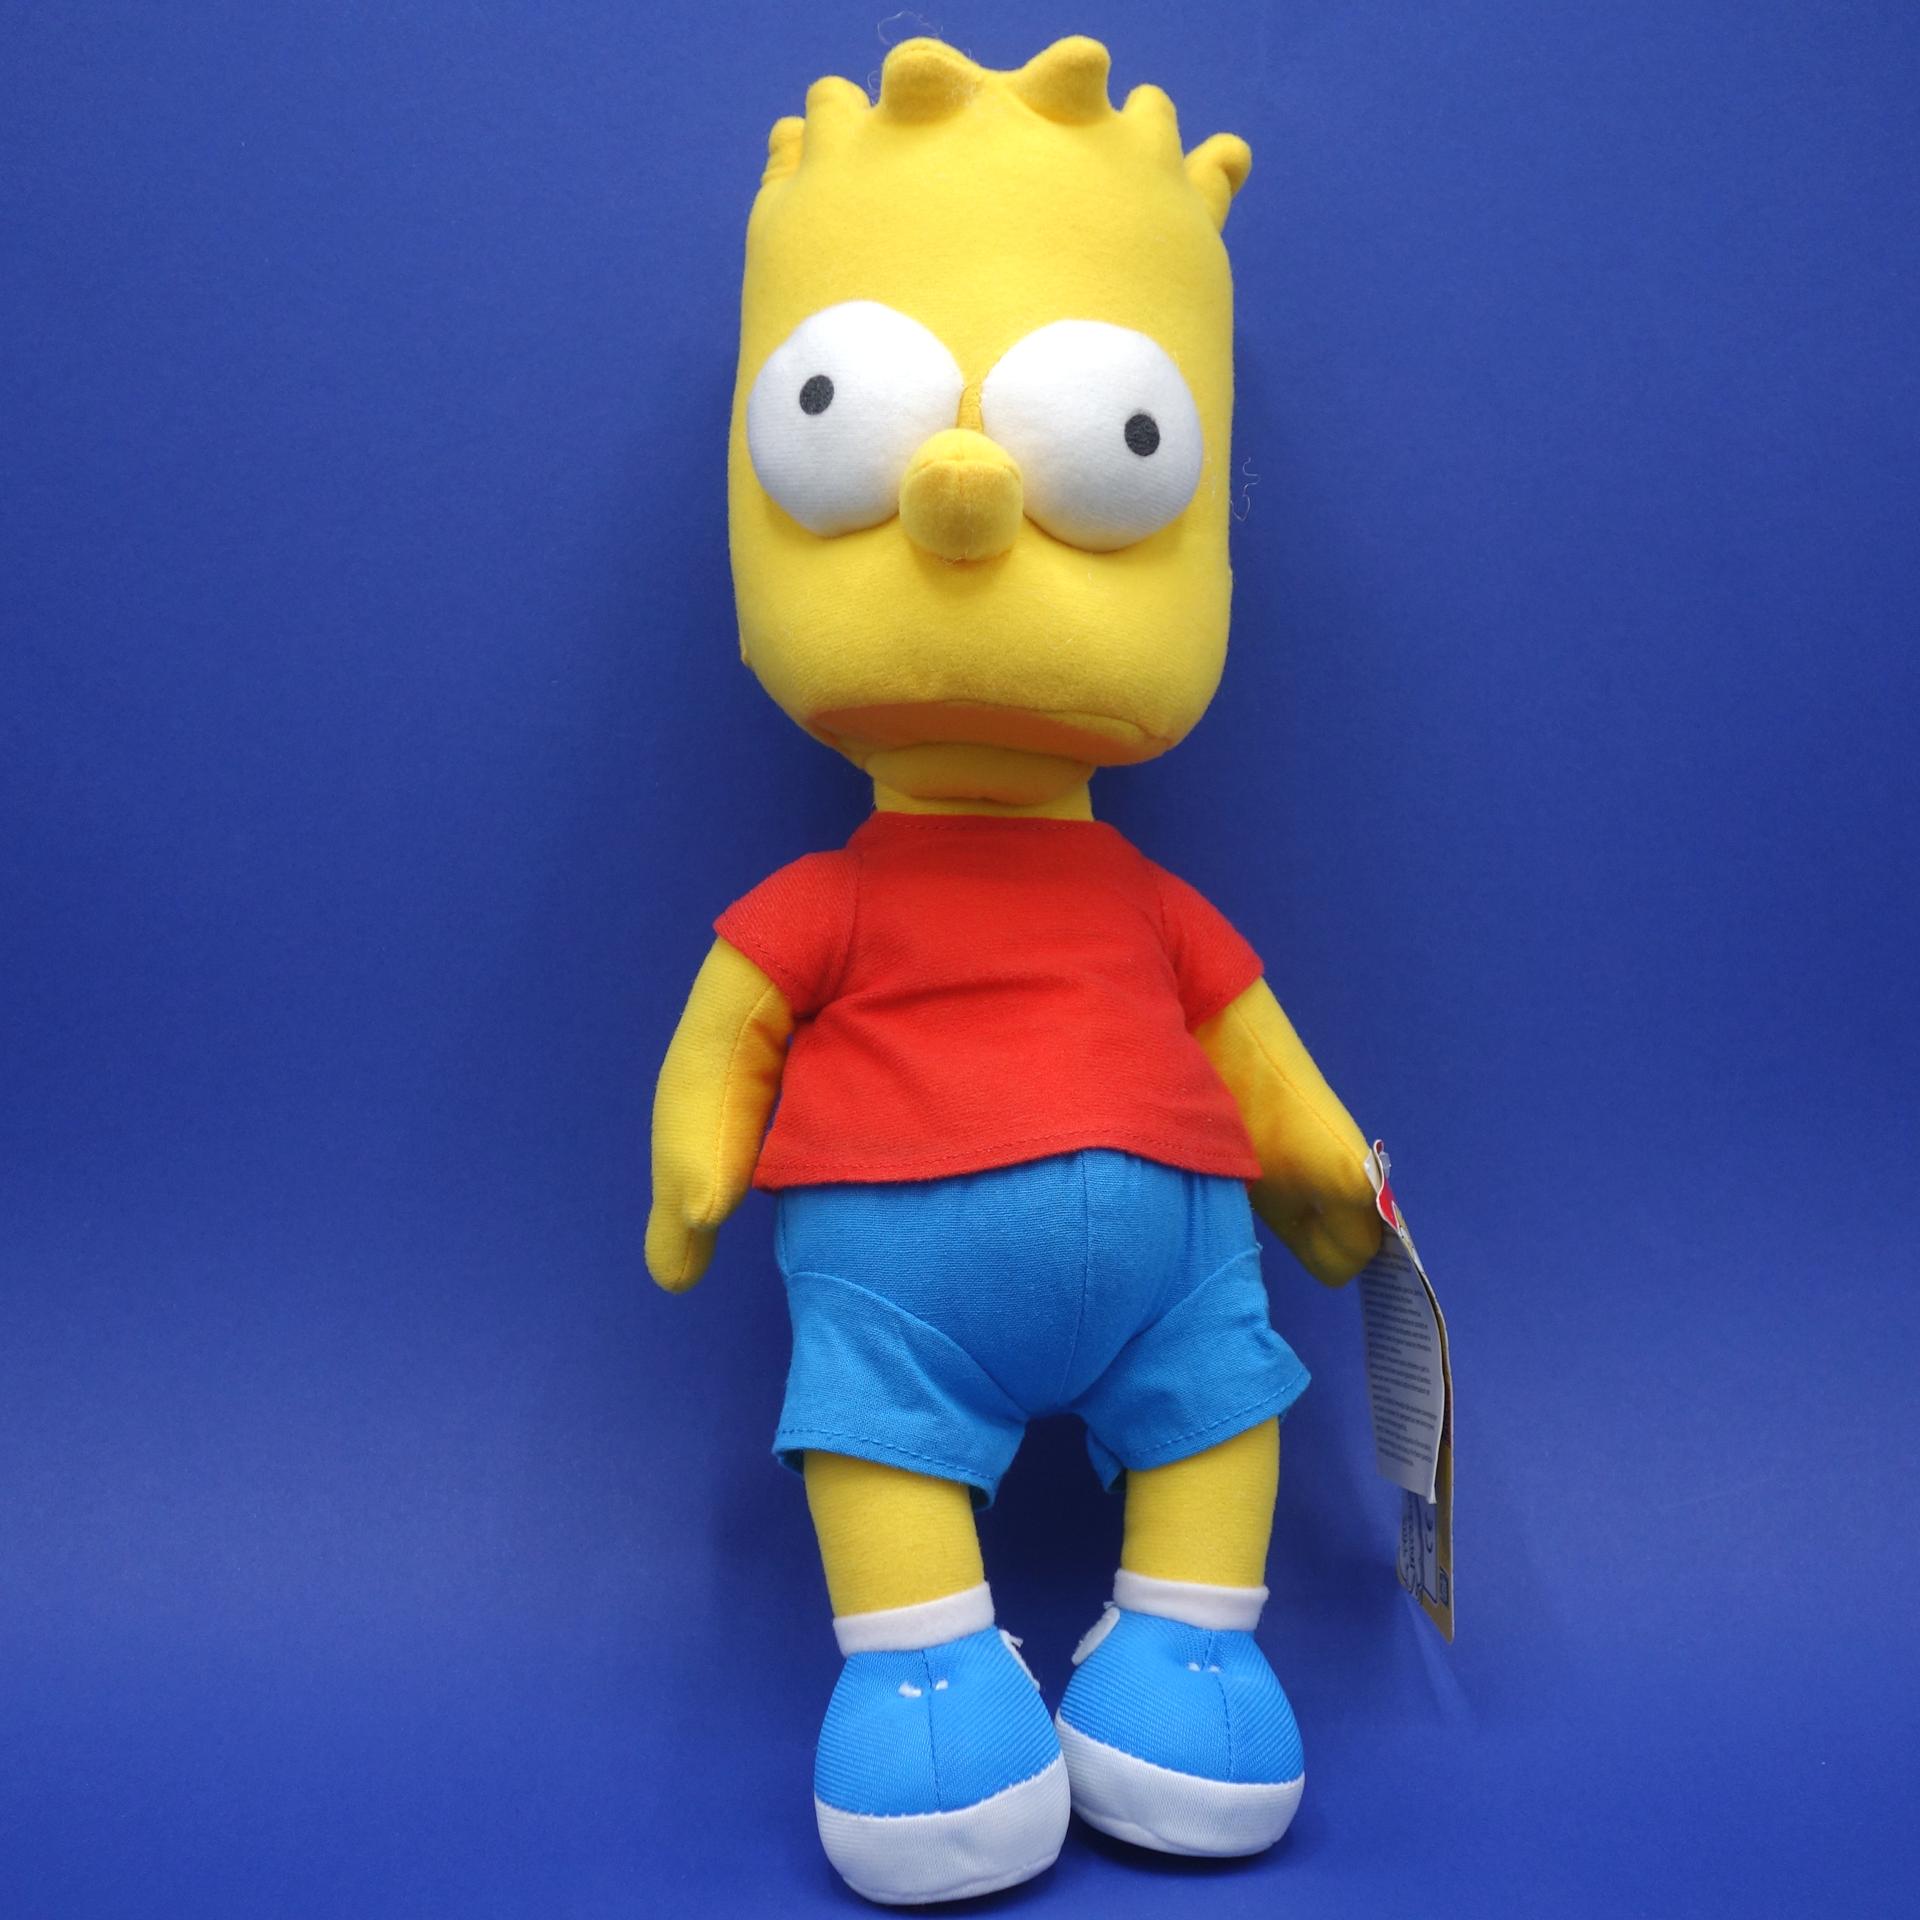 Bart Simpson Plüsch Figur The Simpsons